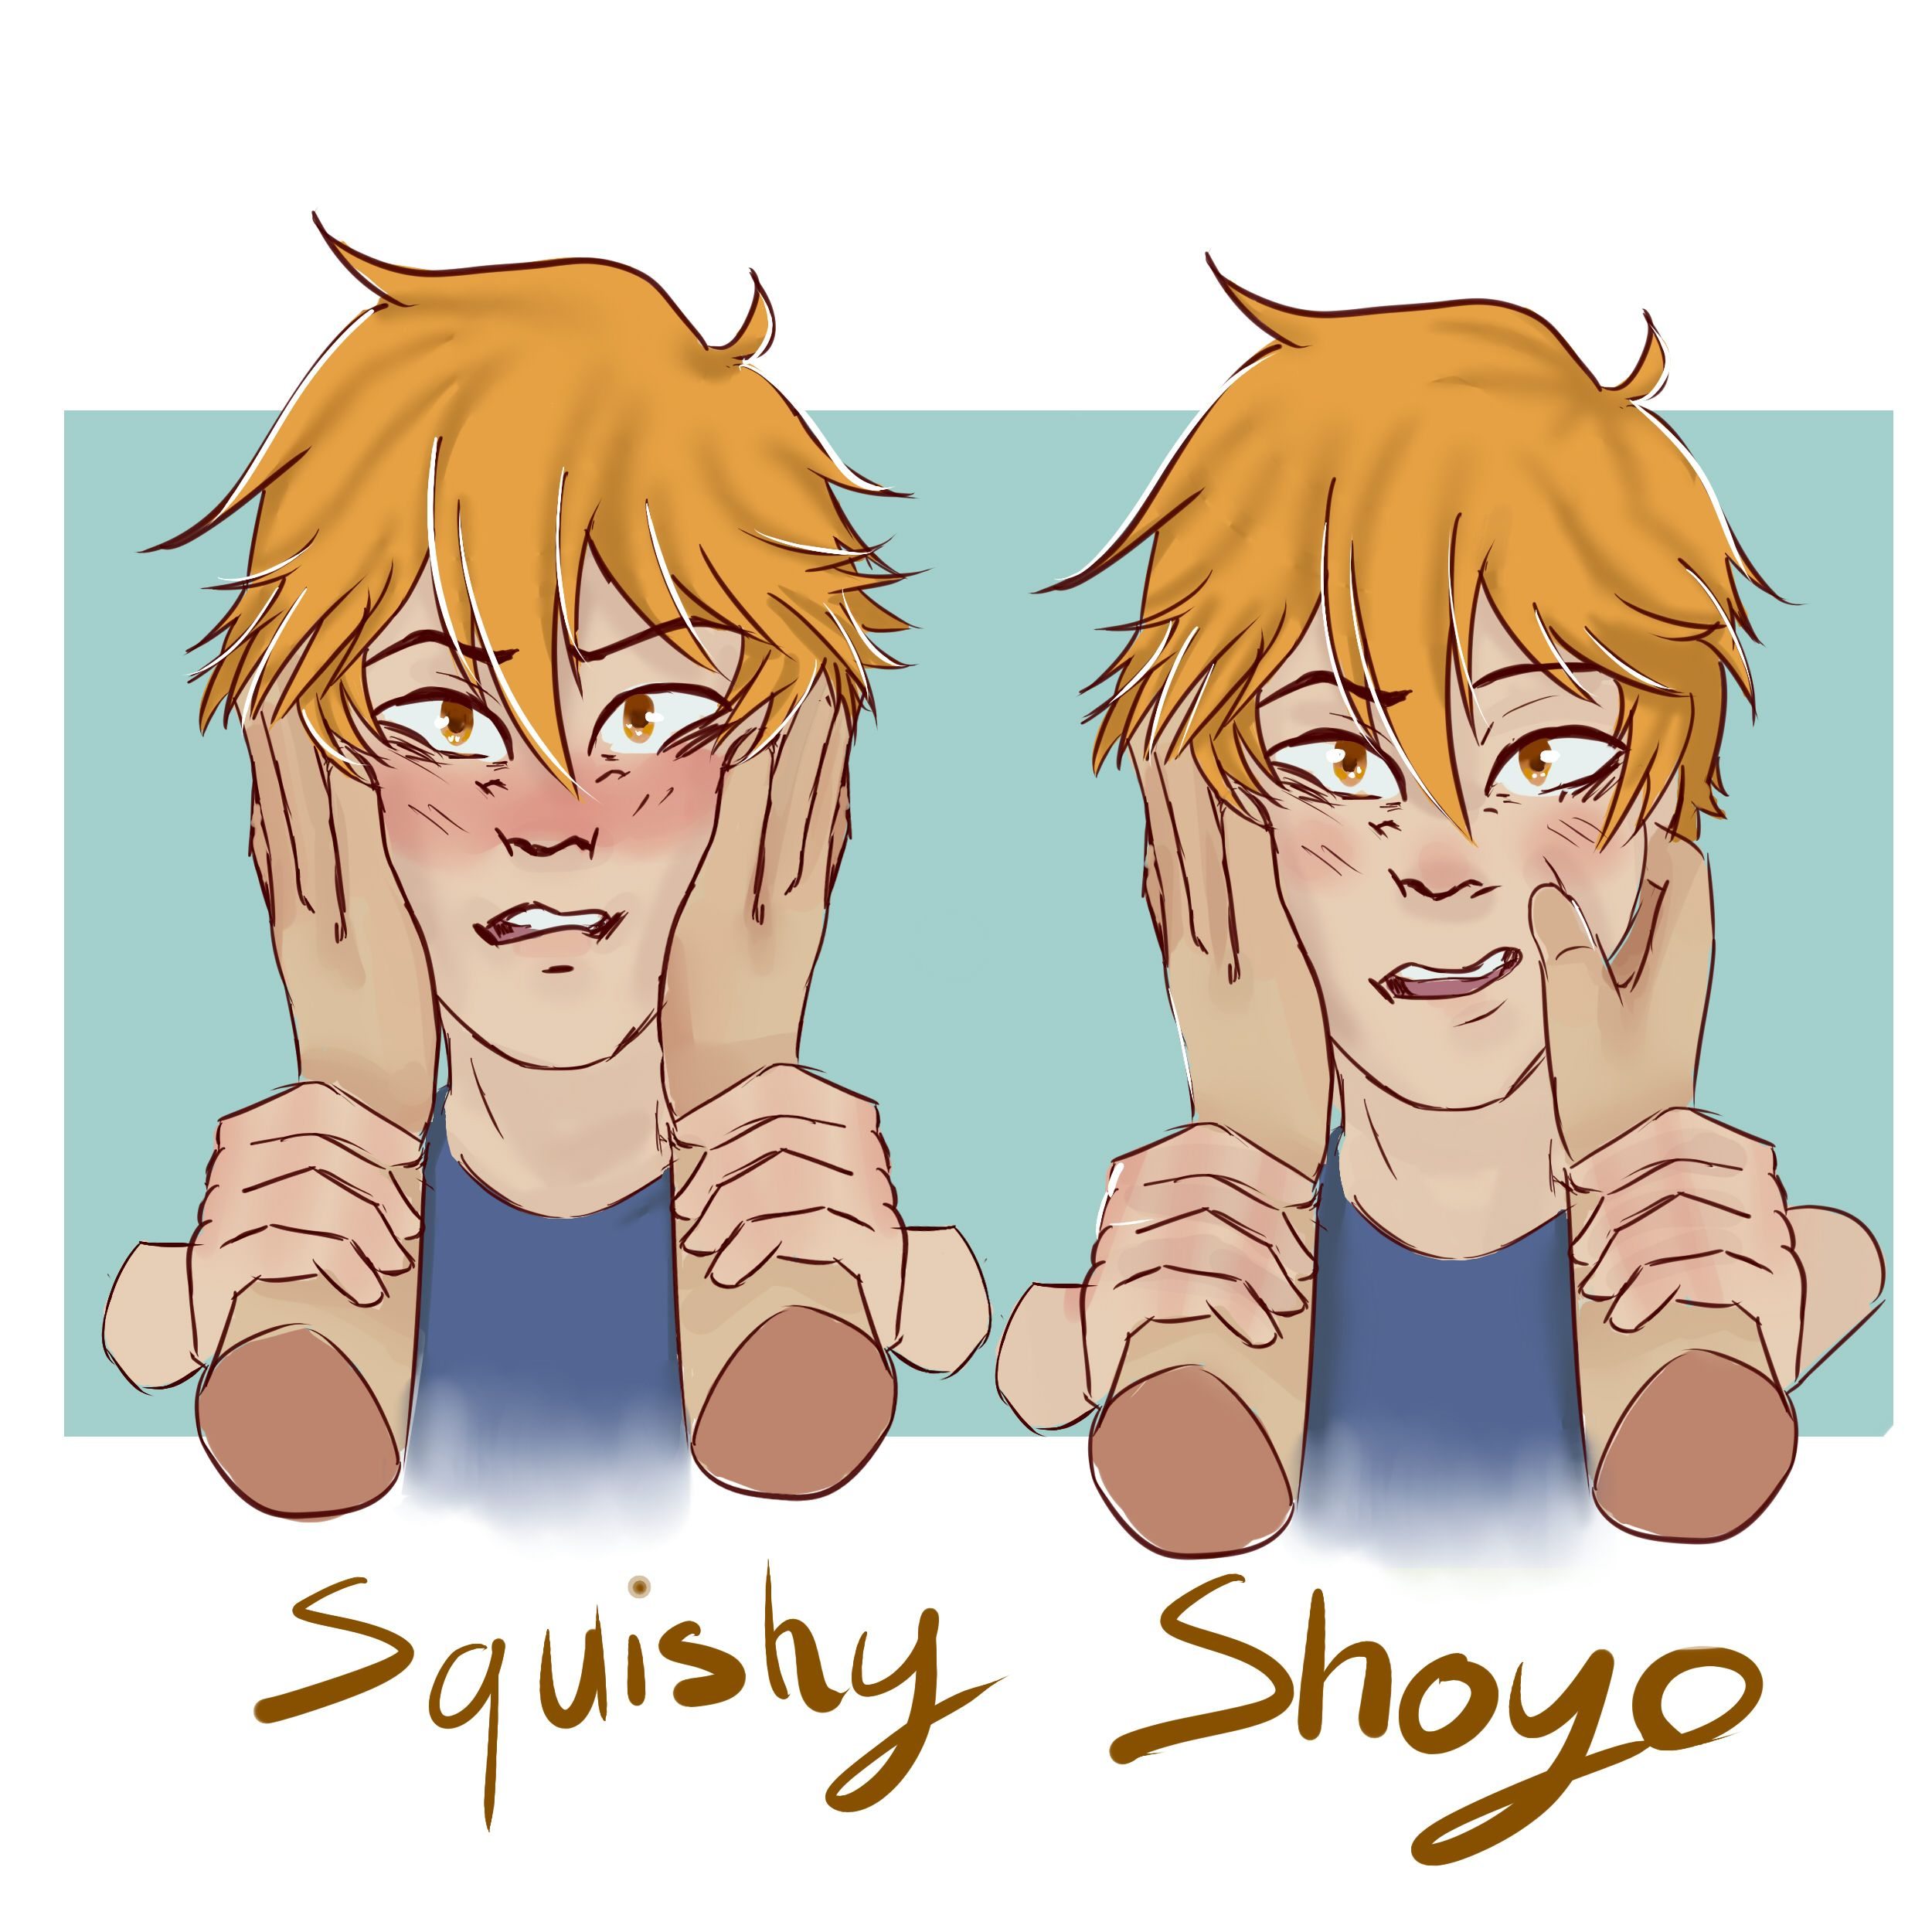 I had fun with that this morning x)   #anime #hinata #manga #elyxen #adorable #animemanga #mangaanime #pinch #squeeze #squish #squishy #haikyuu #hinatashouyou #hinatashouyo #haikyuufanart #hinatashoyo #haikyuuhinata #hinata_shouyo